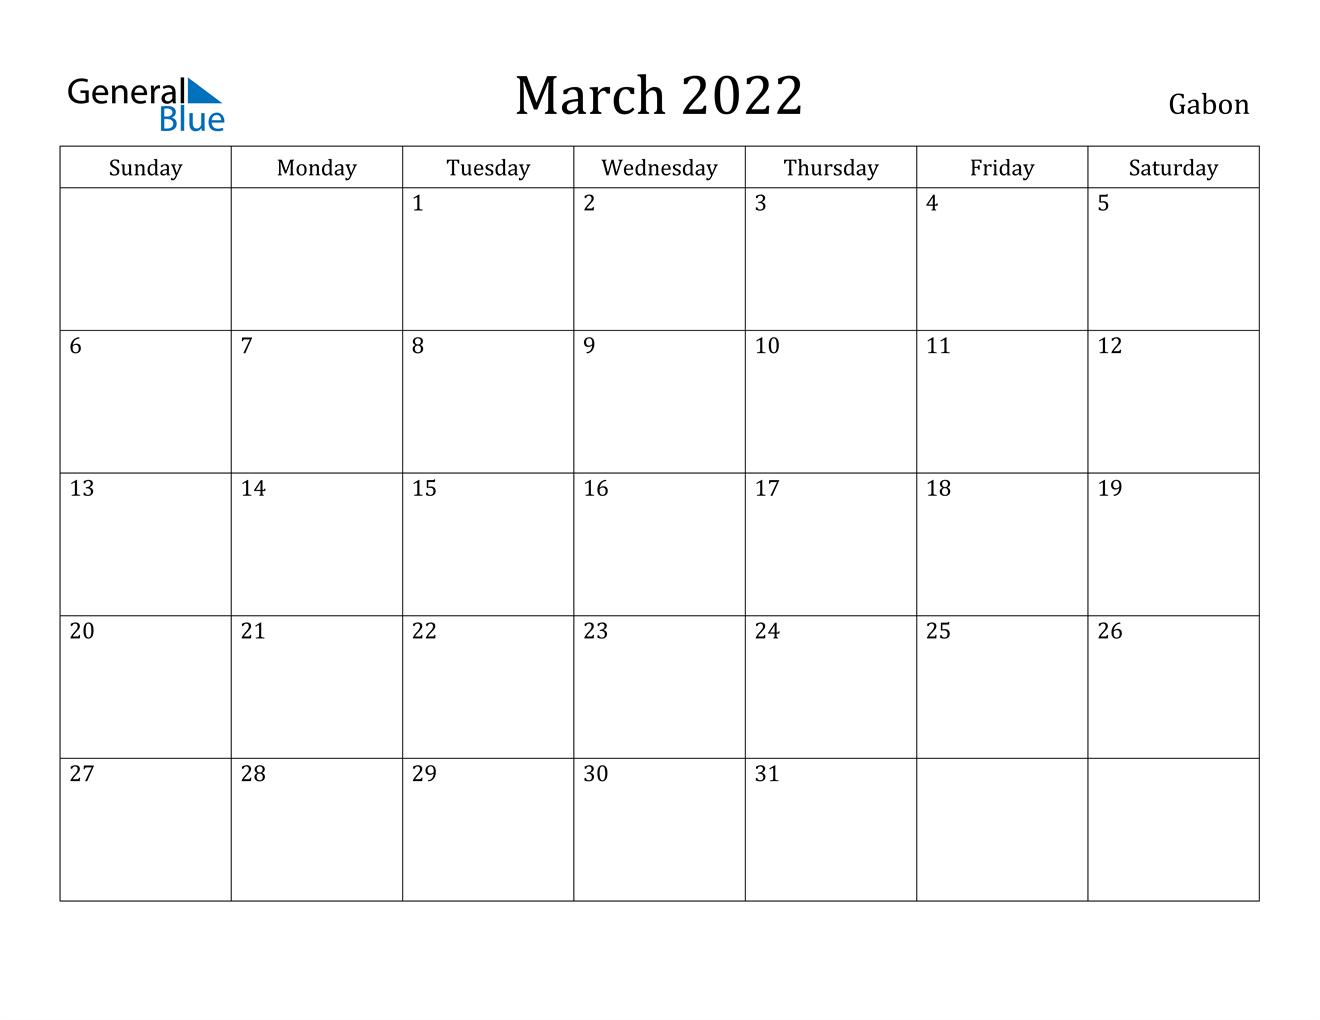 March 2022 Calendar Template.Gabon March 2022 Calendar With Holidays